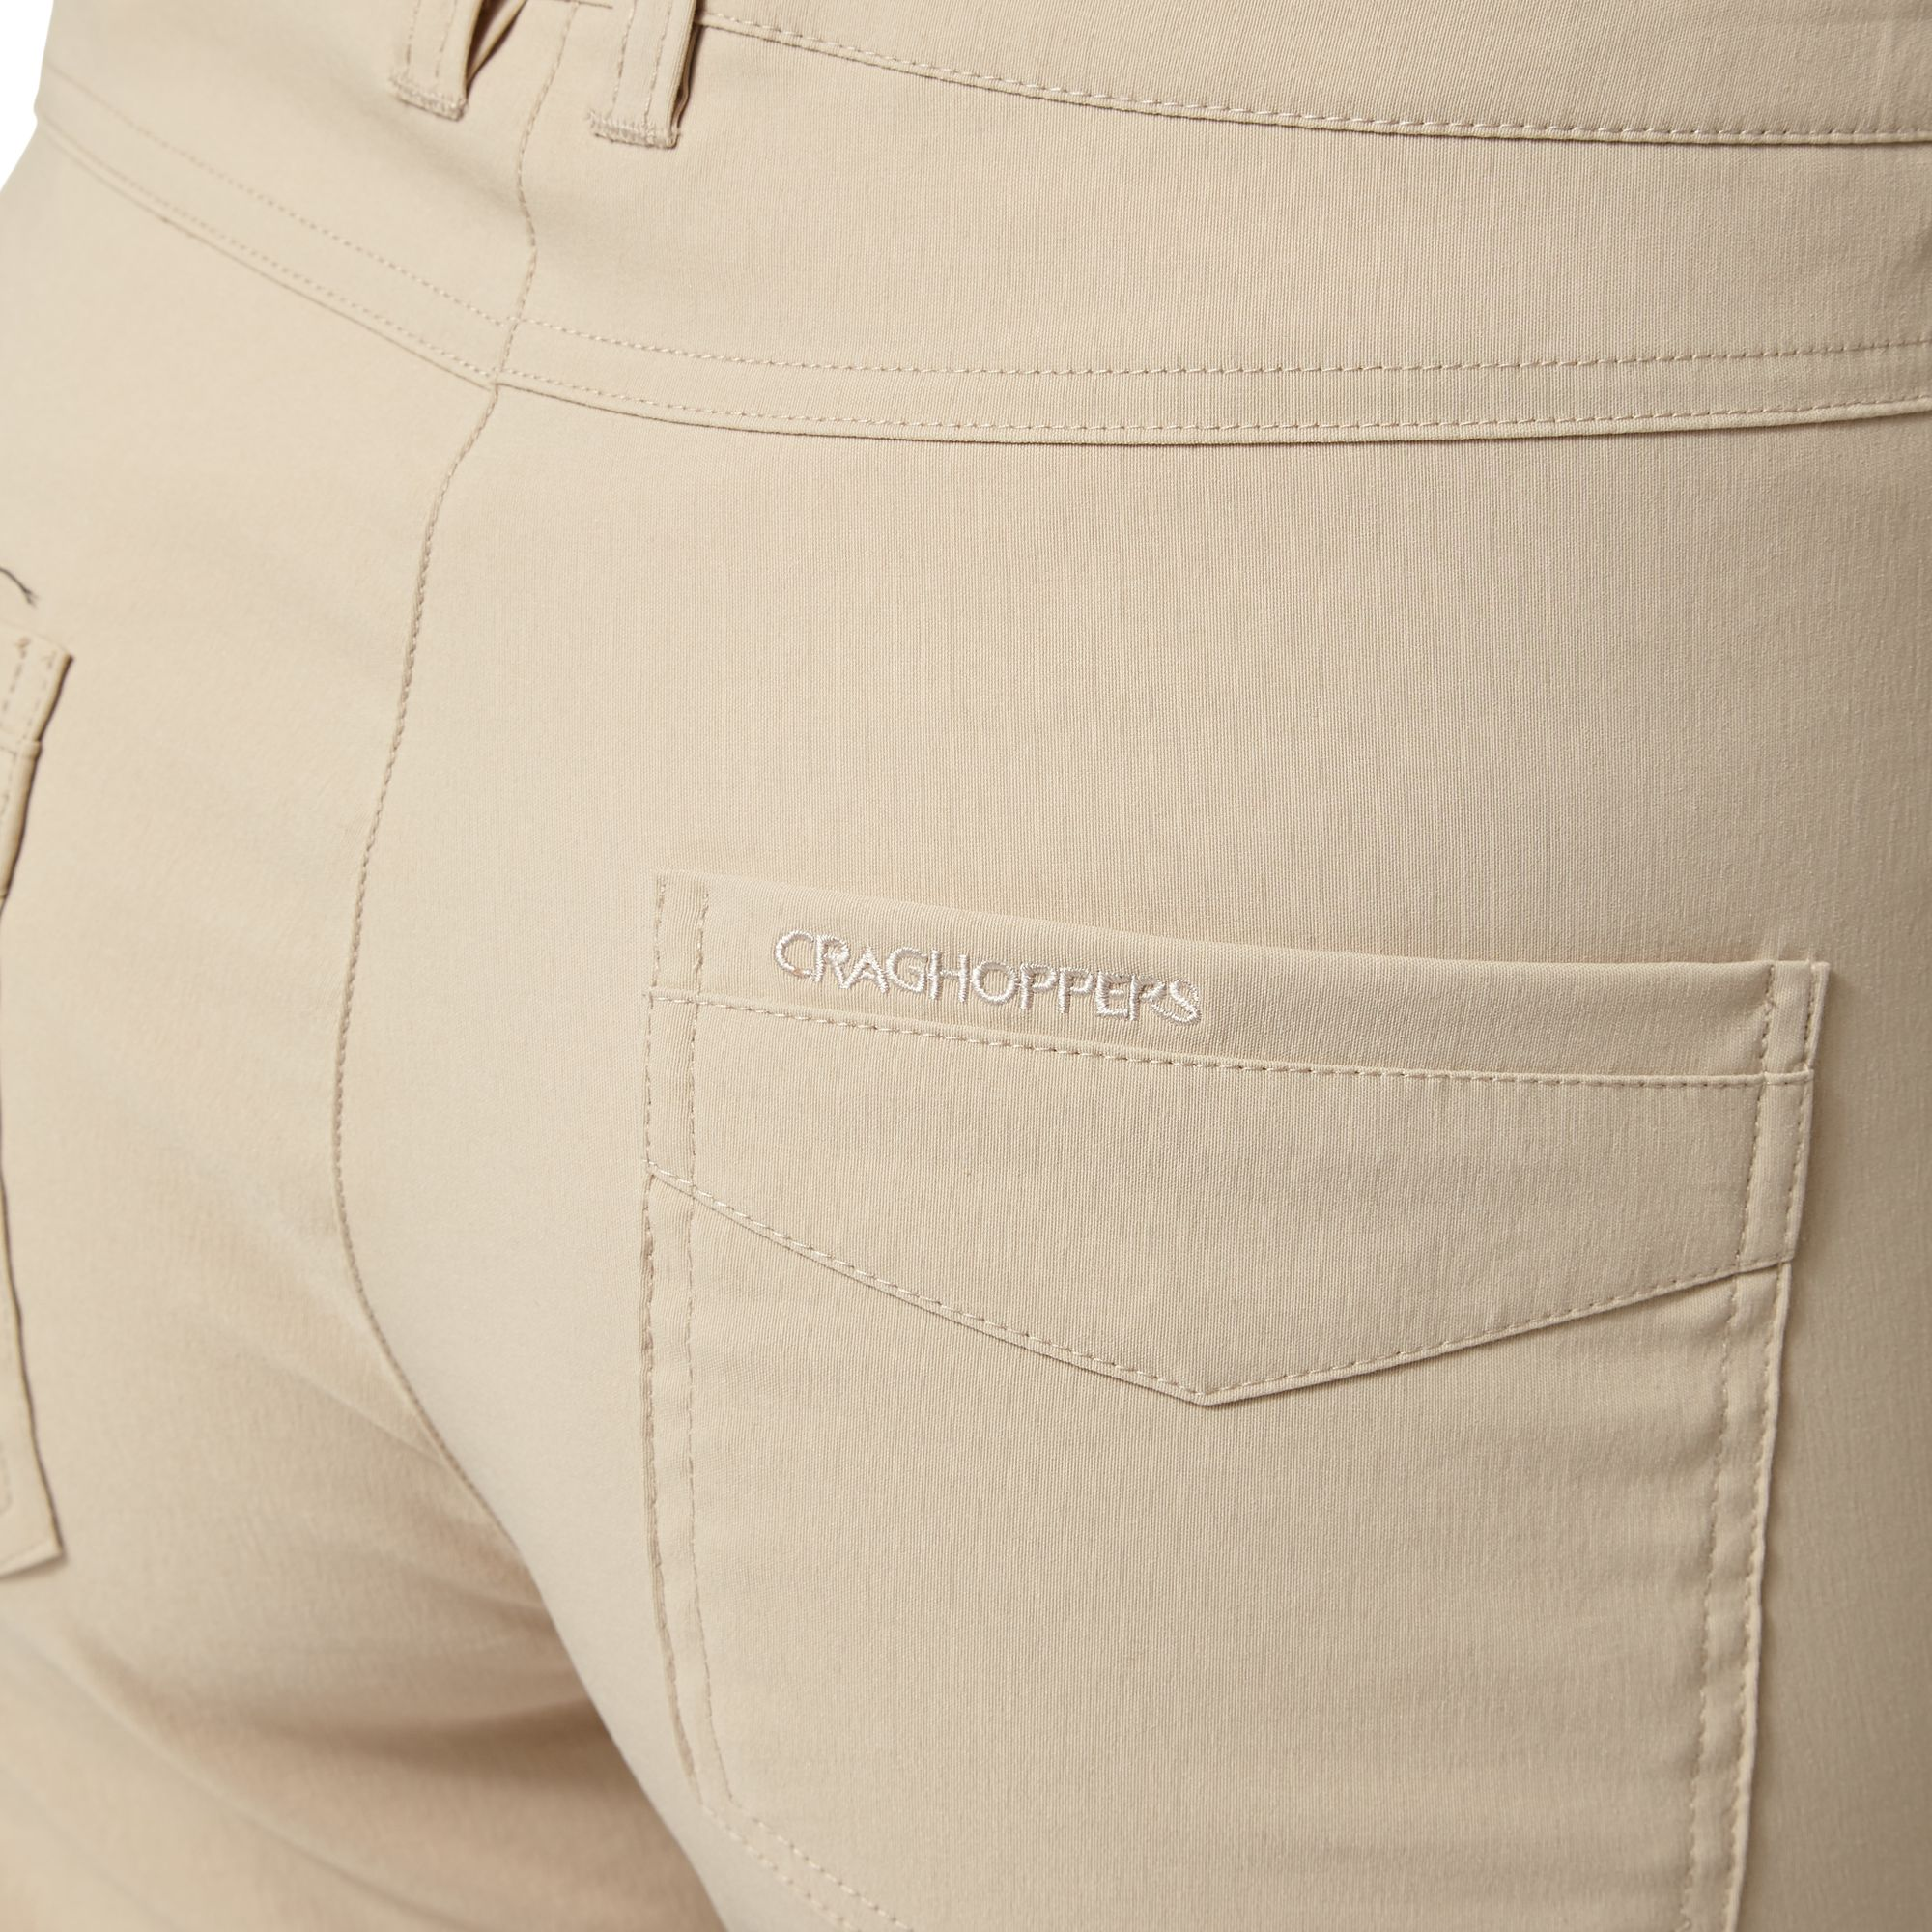 Craghoppers-Pantalon-ADVENTURE-Femme-CG869 miniature 13